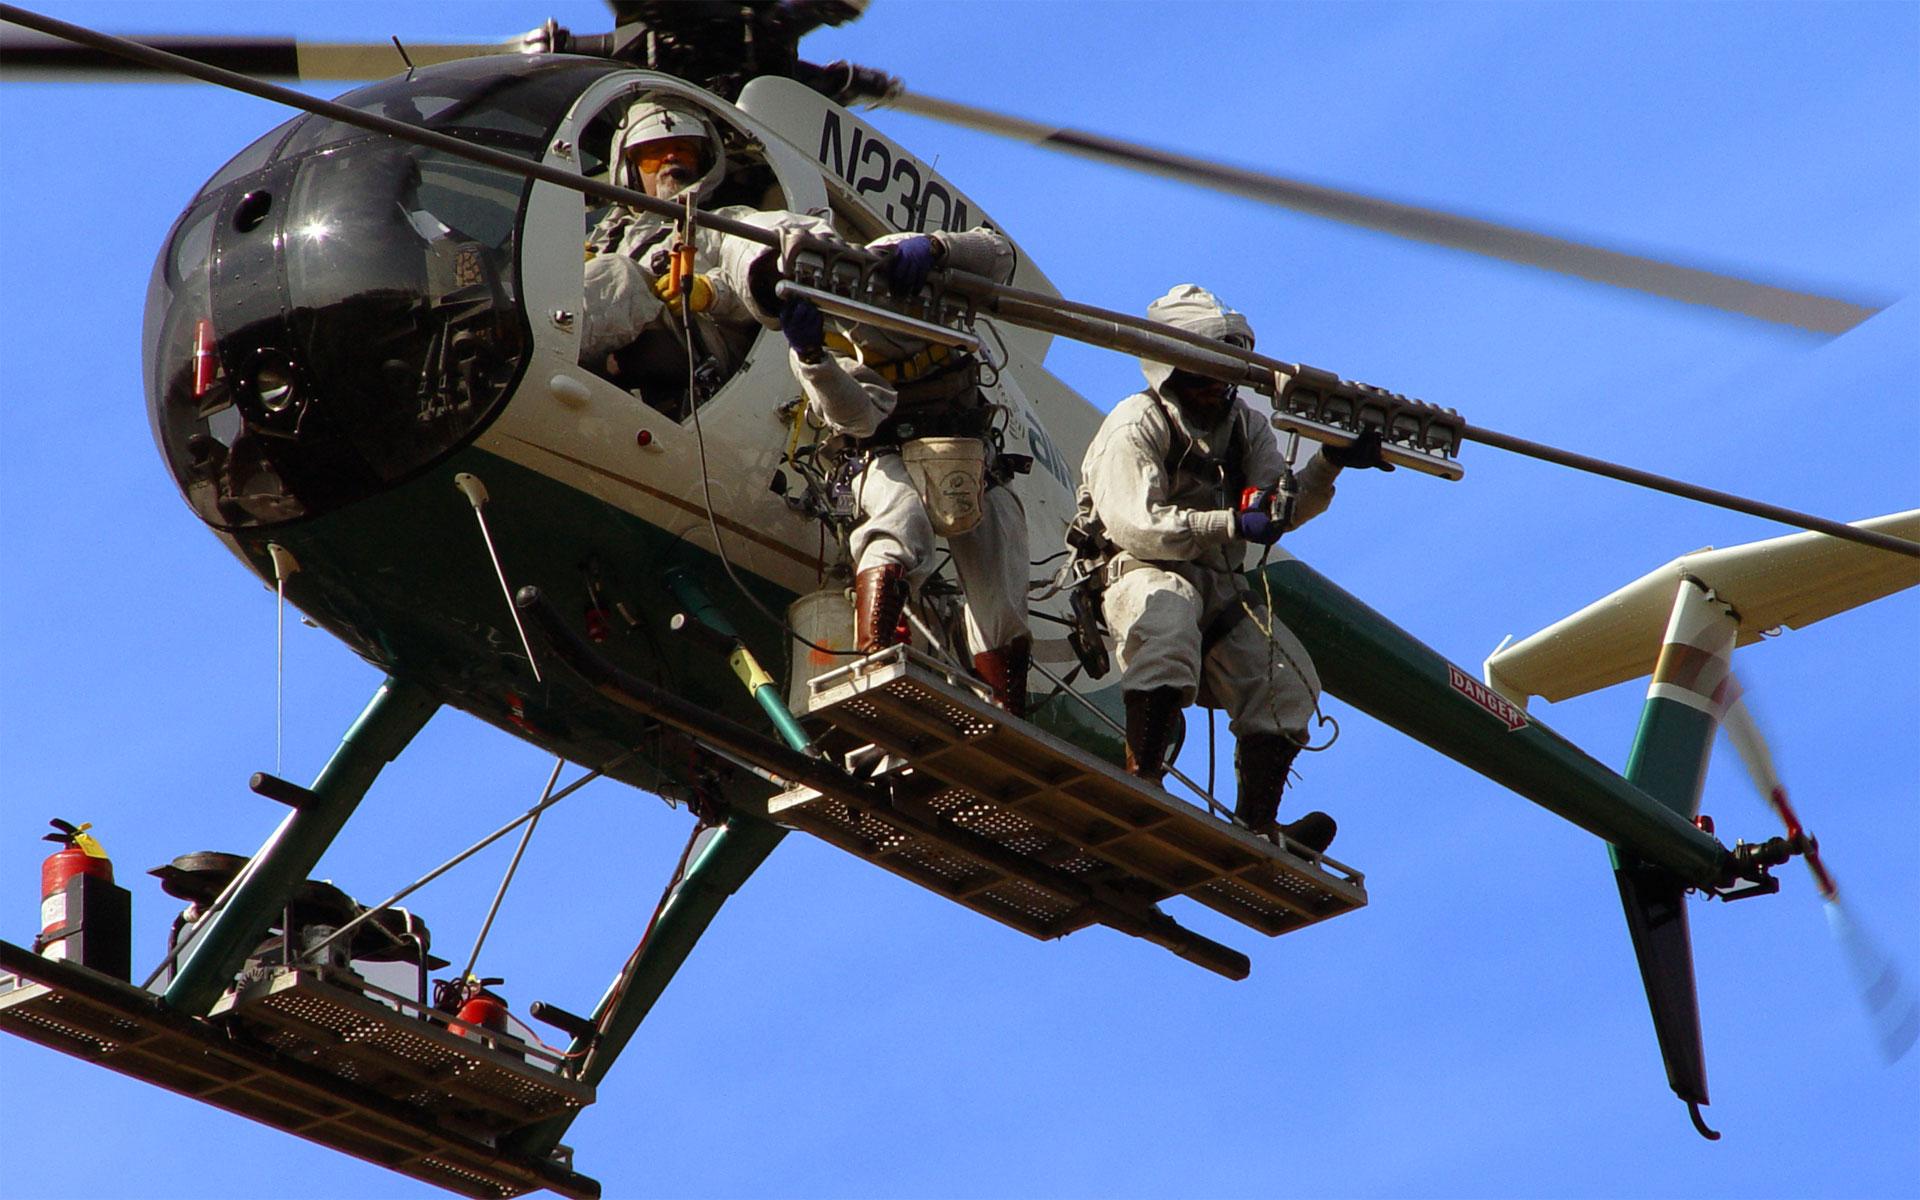 Slide 1 – Airborne Utility Services